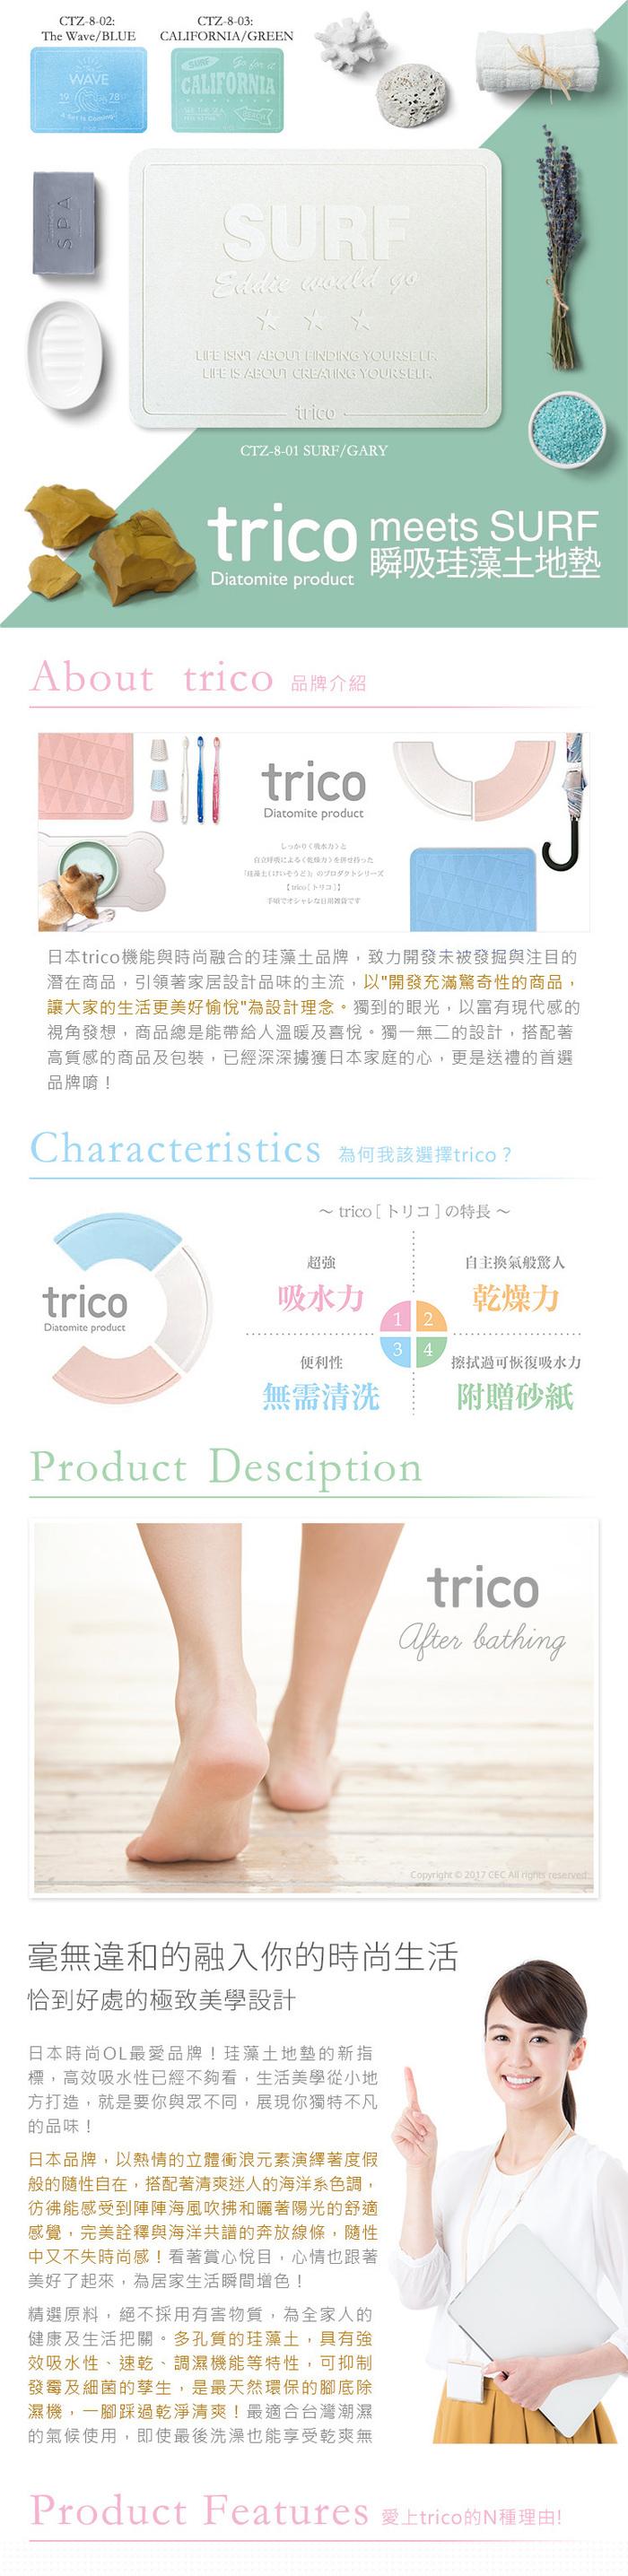 trico|meets SURF瞬吸珪藻土地墊